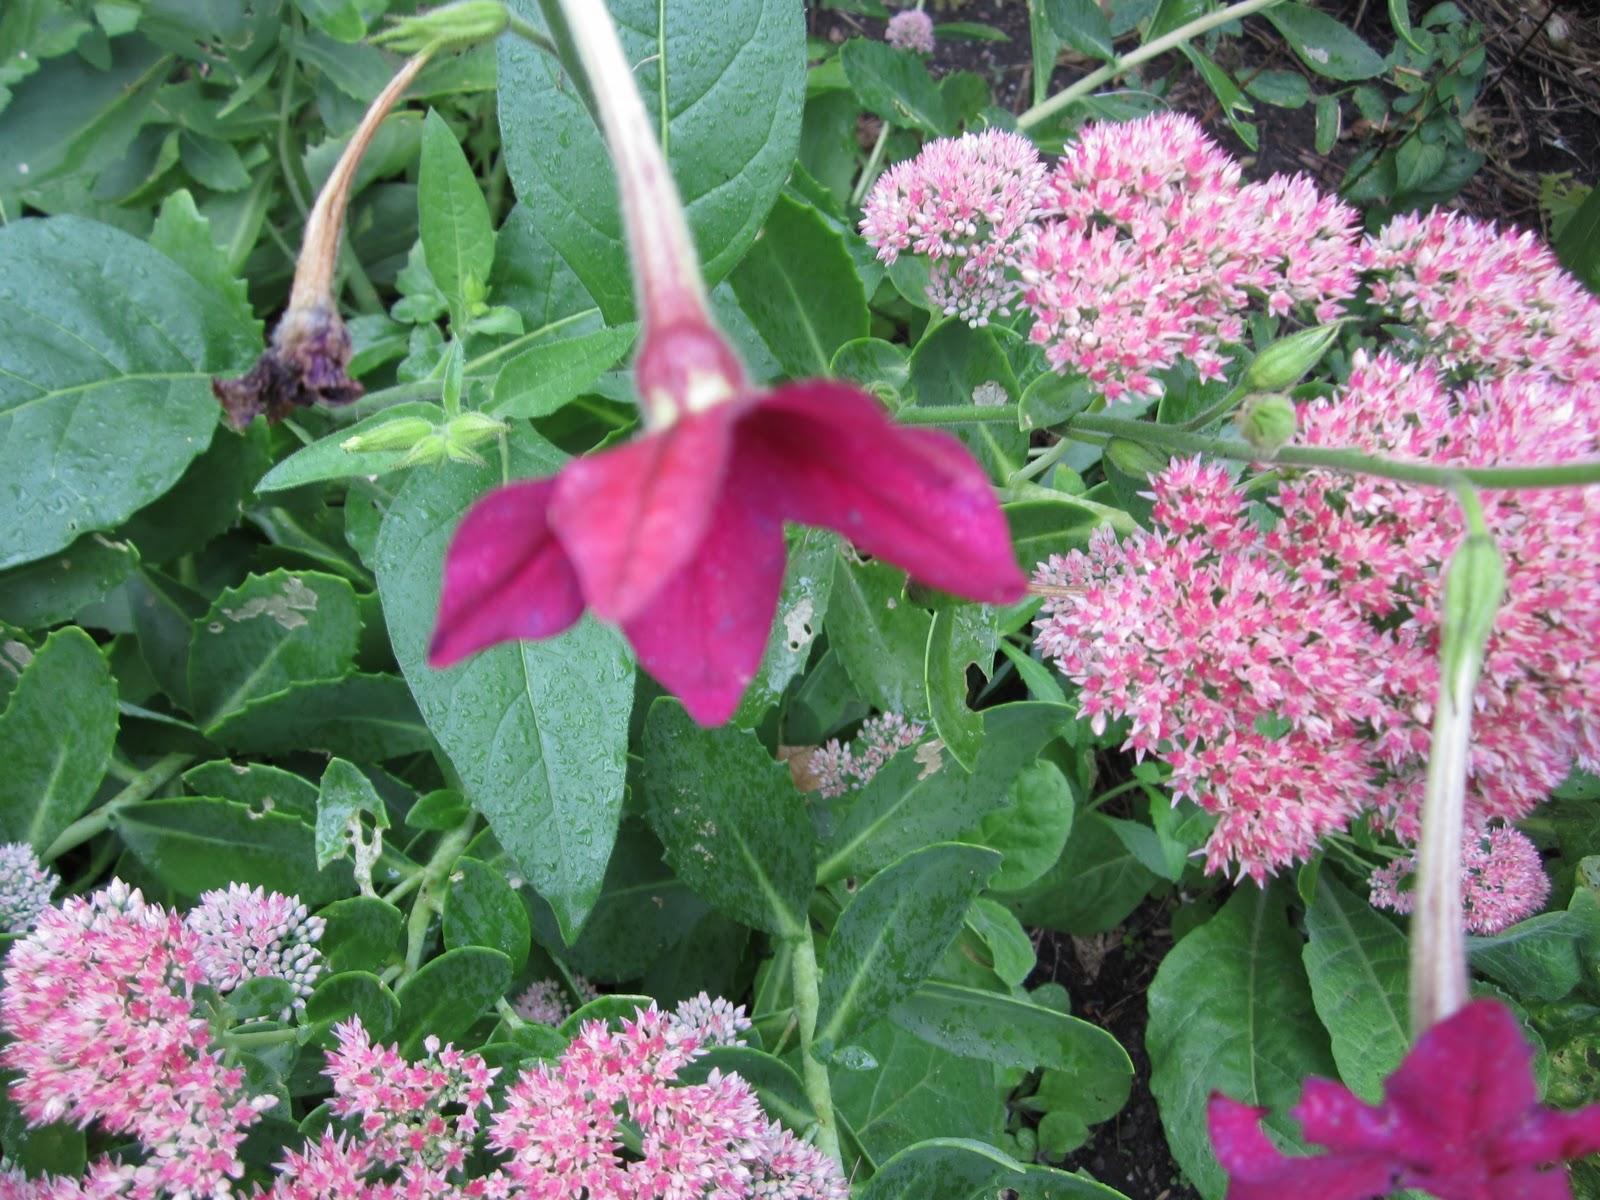 Clomid endometriosis pain